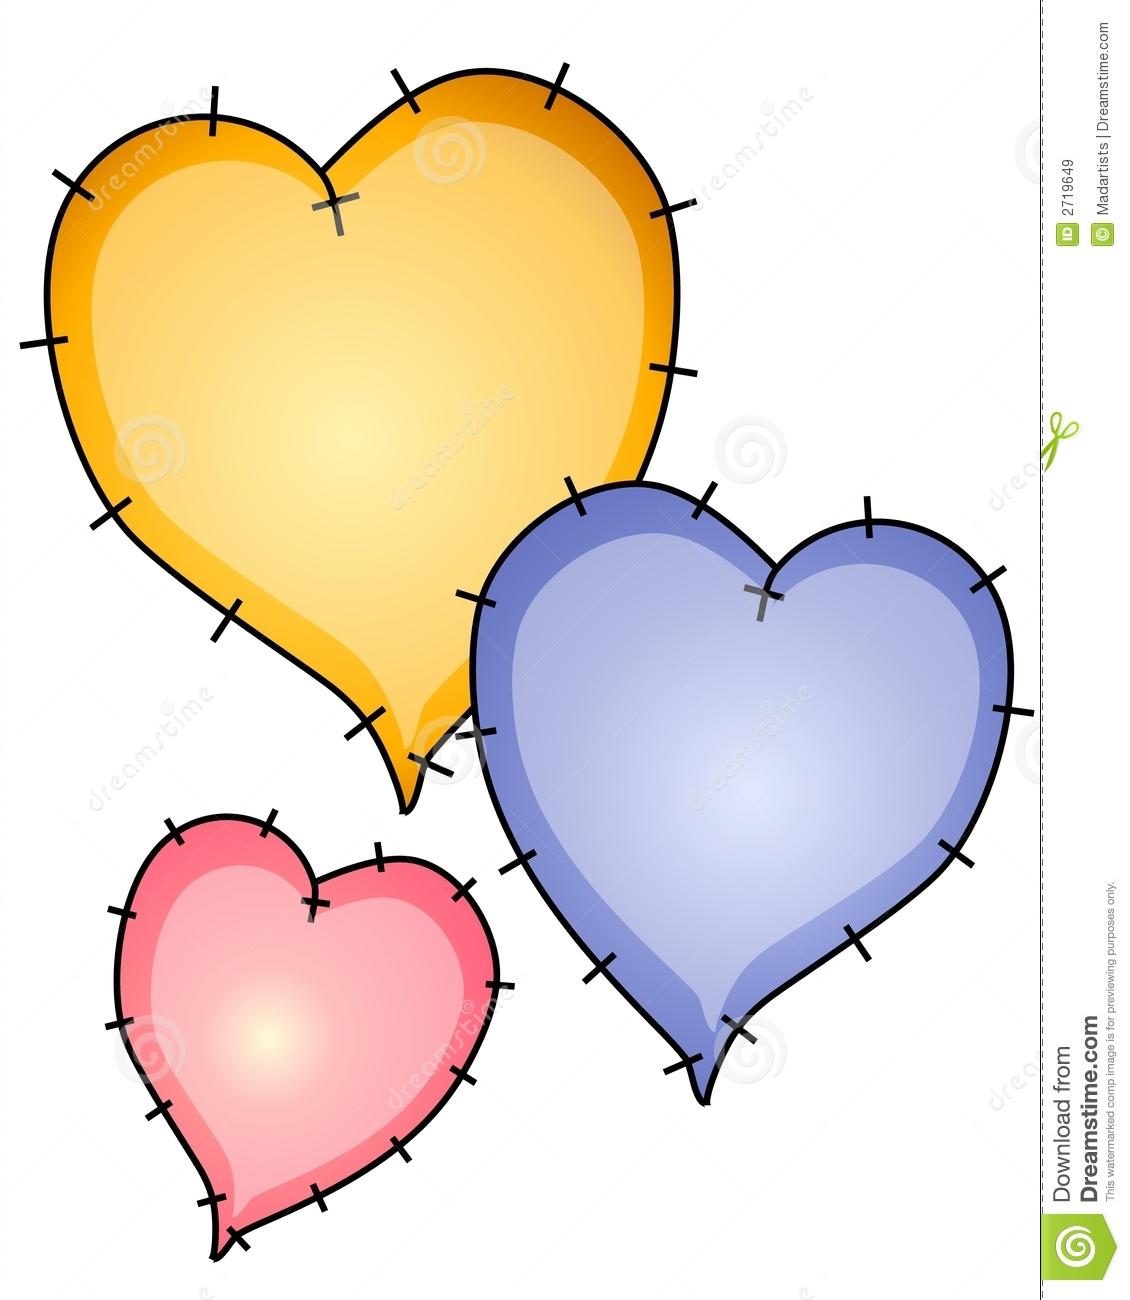 Heart Quilt Patches Clip Art